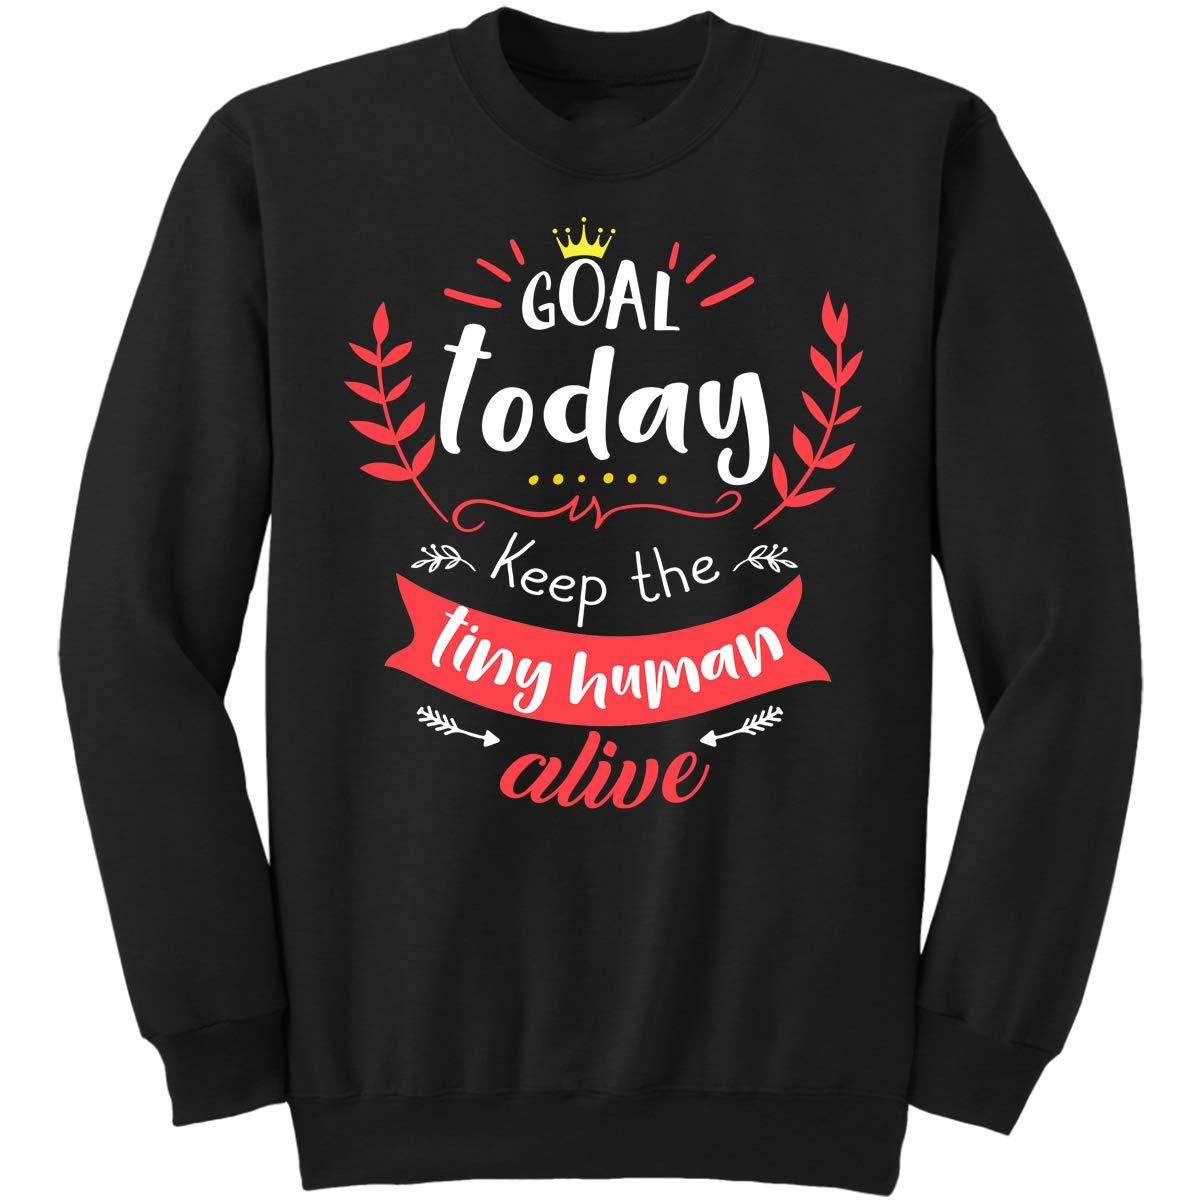 DoozyGifts99 Goal Today Keep The Tiny Humans Alive-F Sweatshirt